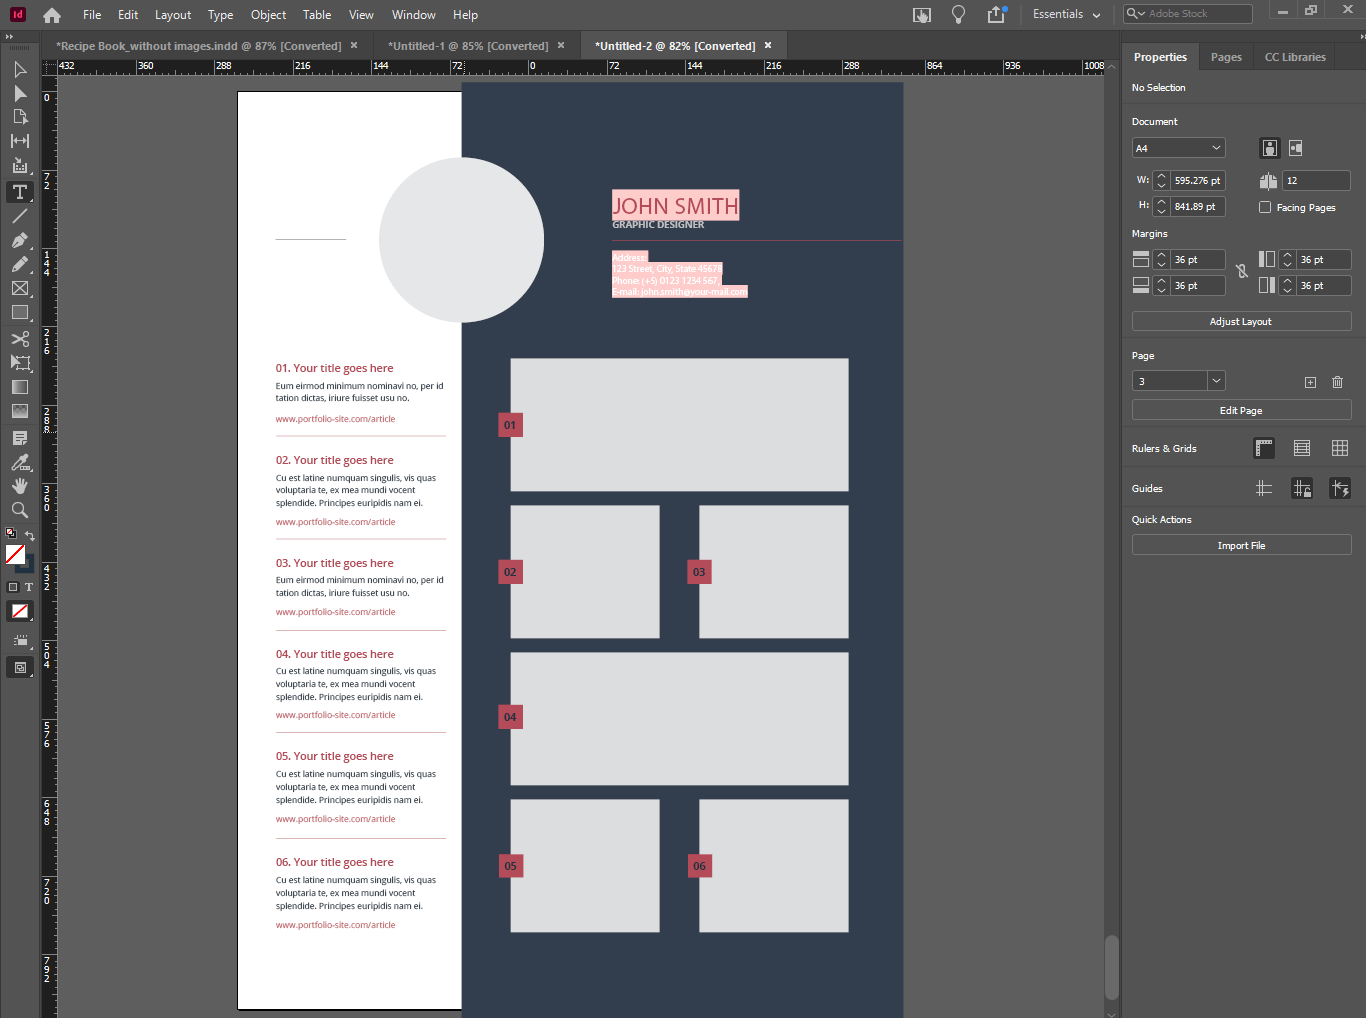 resume on indesign - Photoshop vs Illustrator vs InDesign